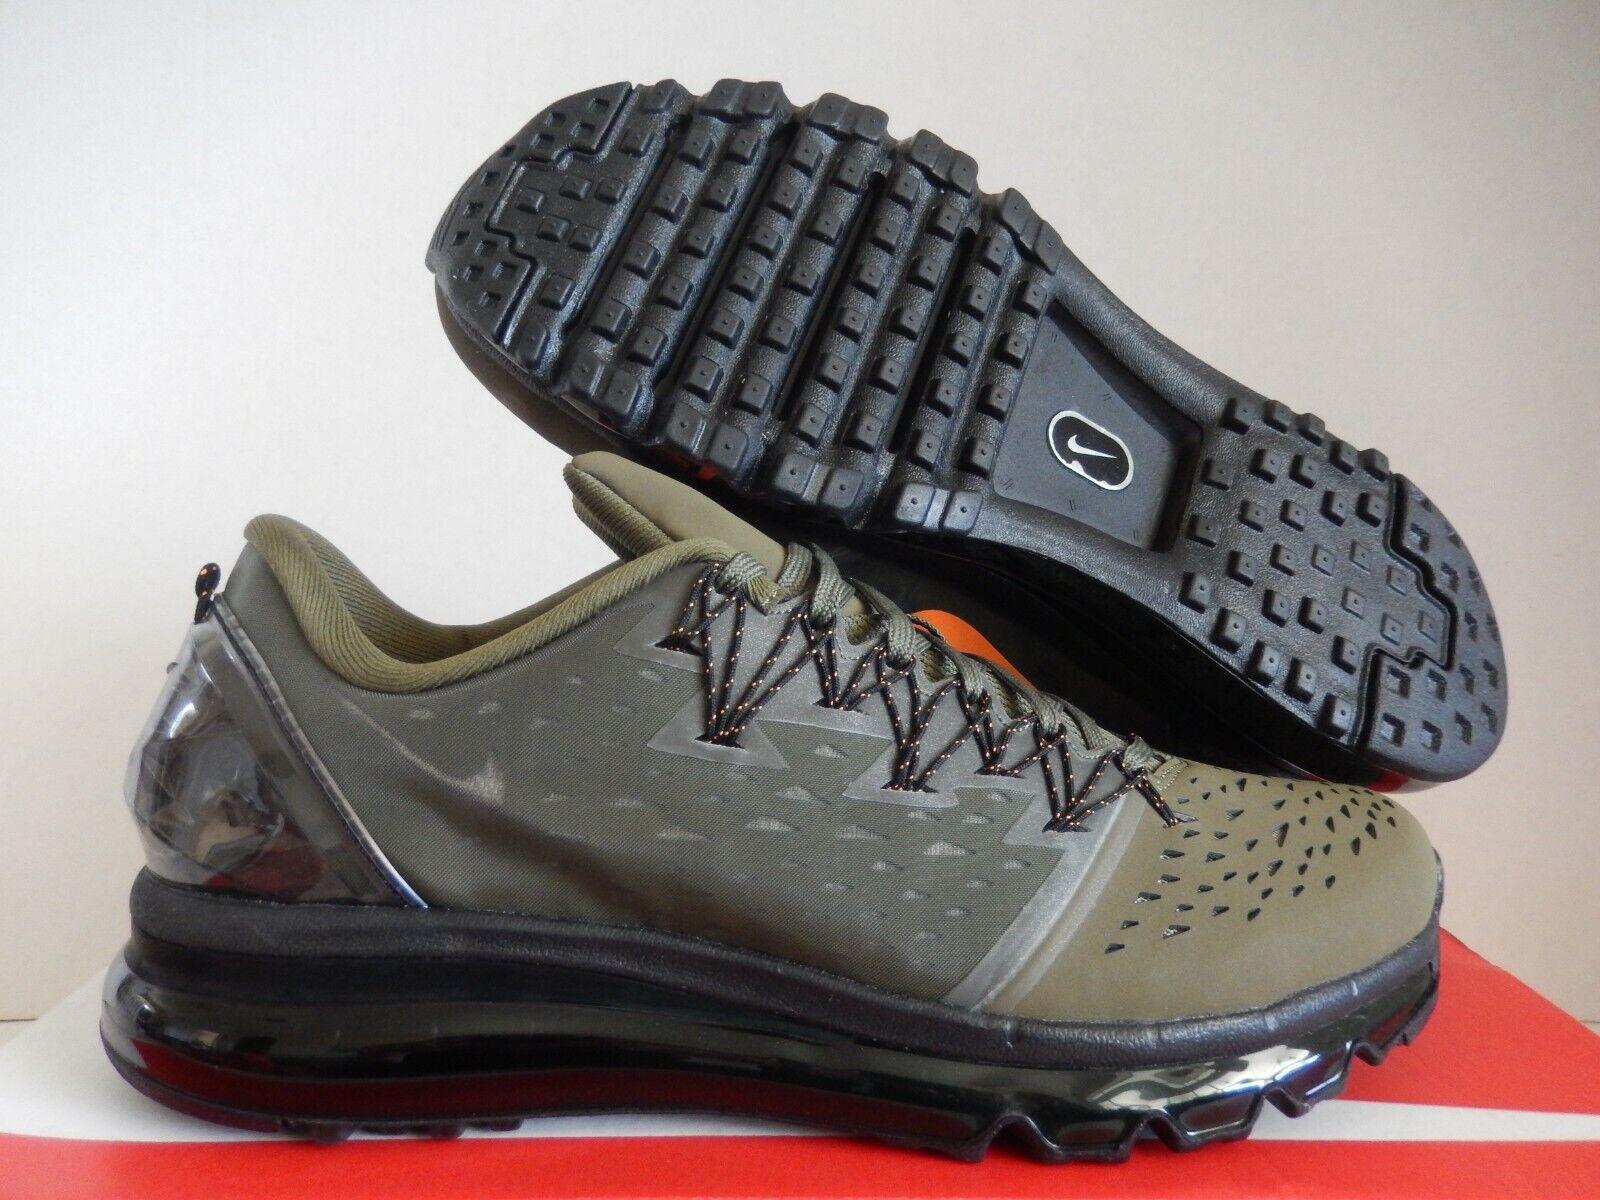 Nike Air Max 90 Prem Dark Grey Olive Green Mens Trainers